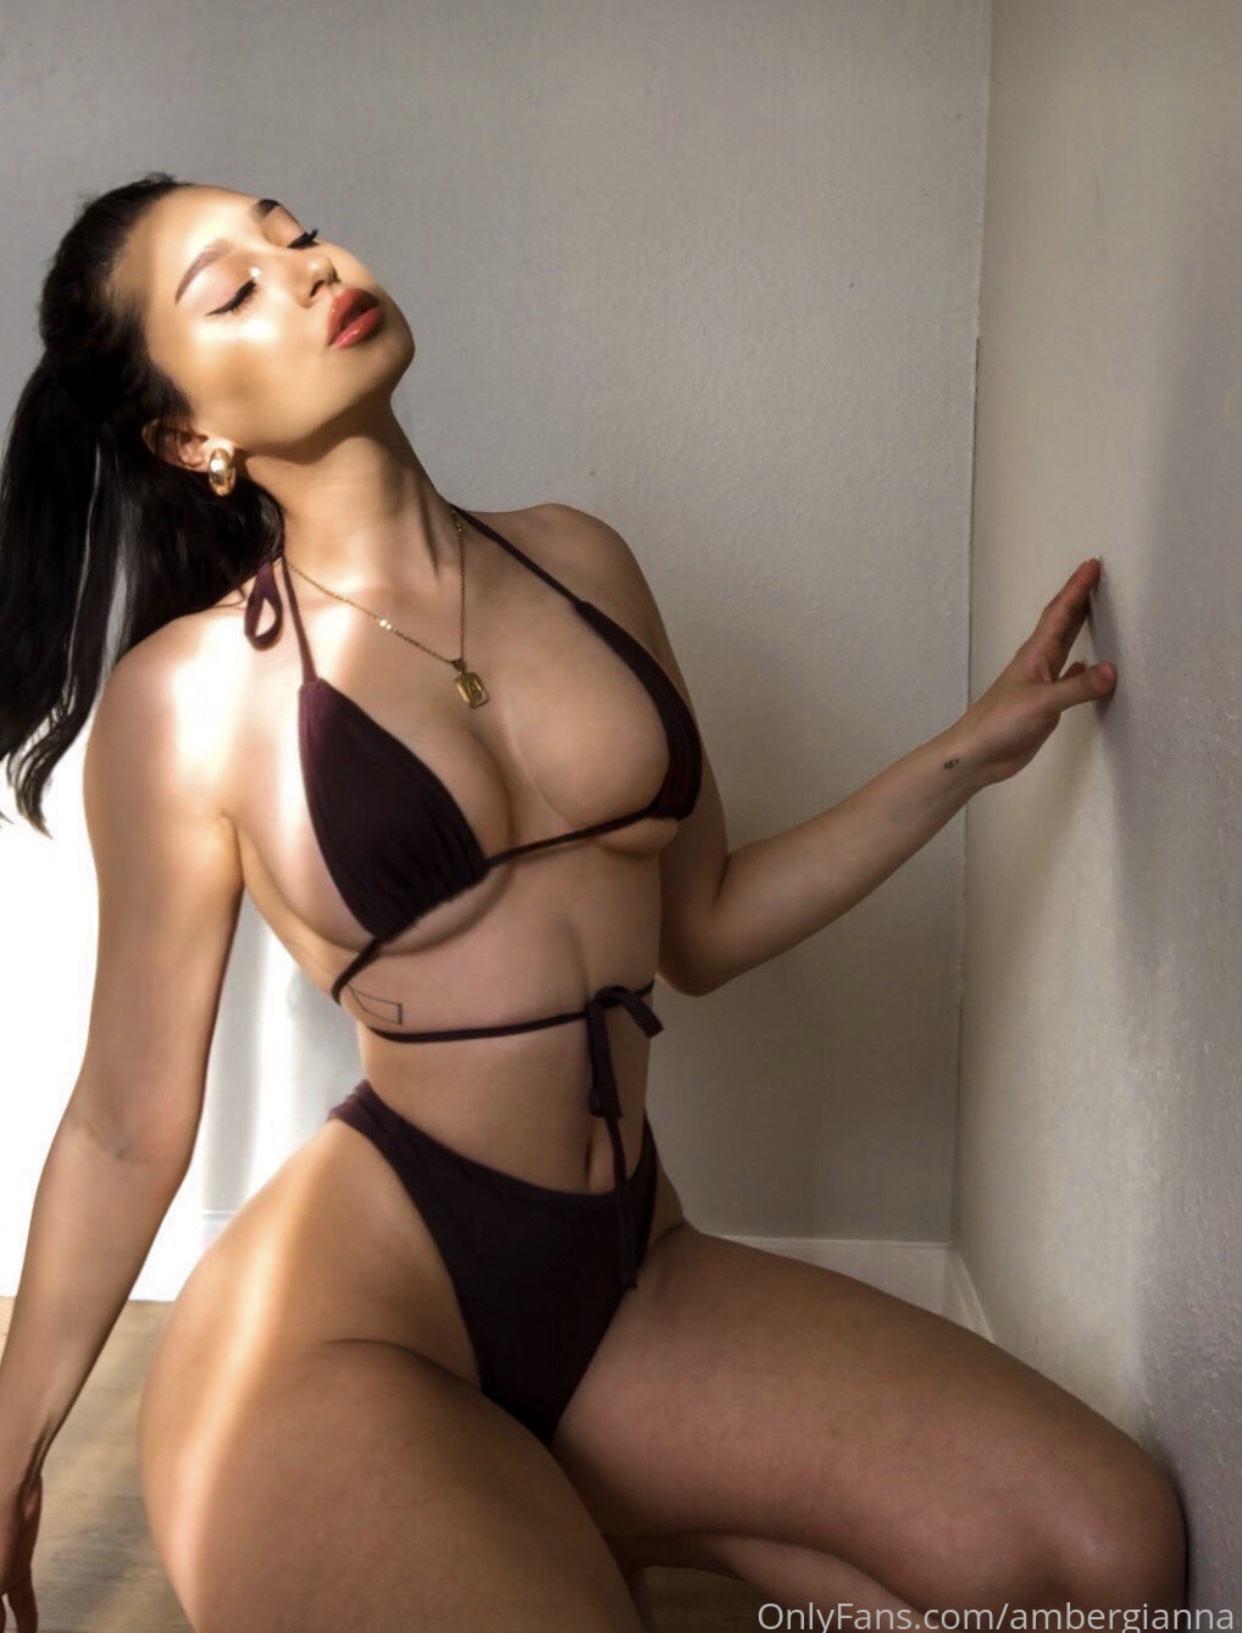 Amber Gianna Onlyfans 0048